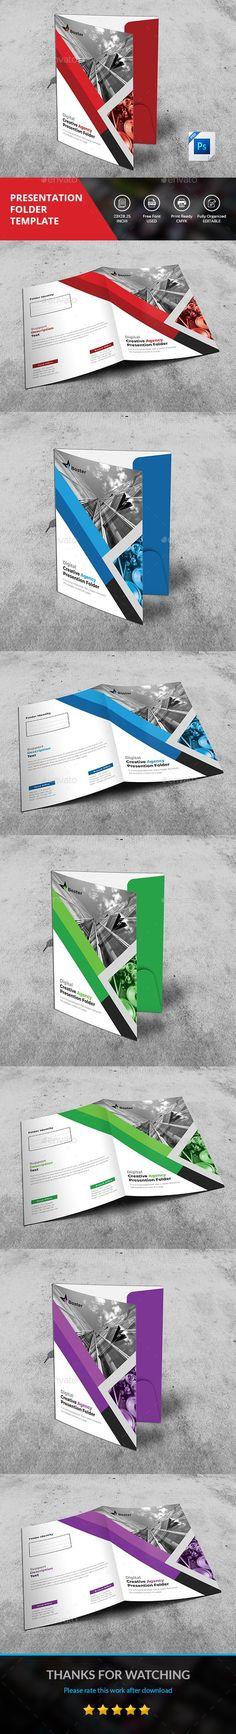 #Presentation Folder - #Stationery Print #Templates Download here: https://graphicriver.net/item/presentation-folder/20253927?ref=alena994